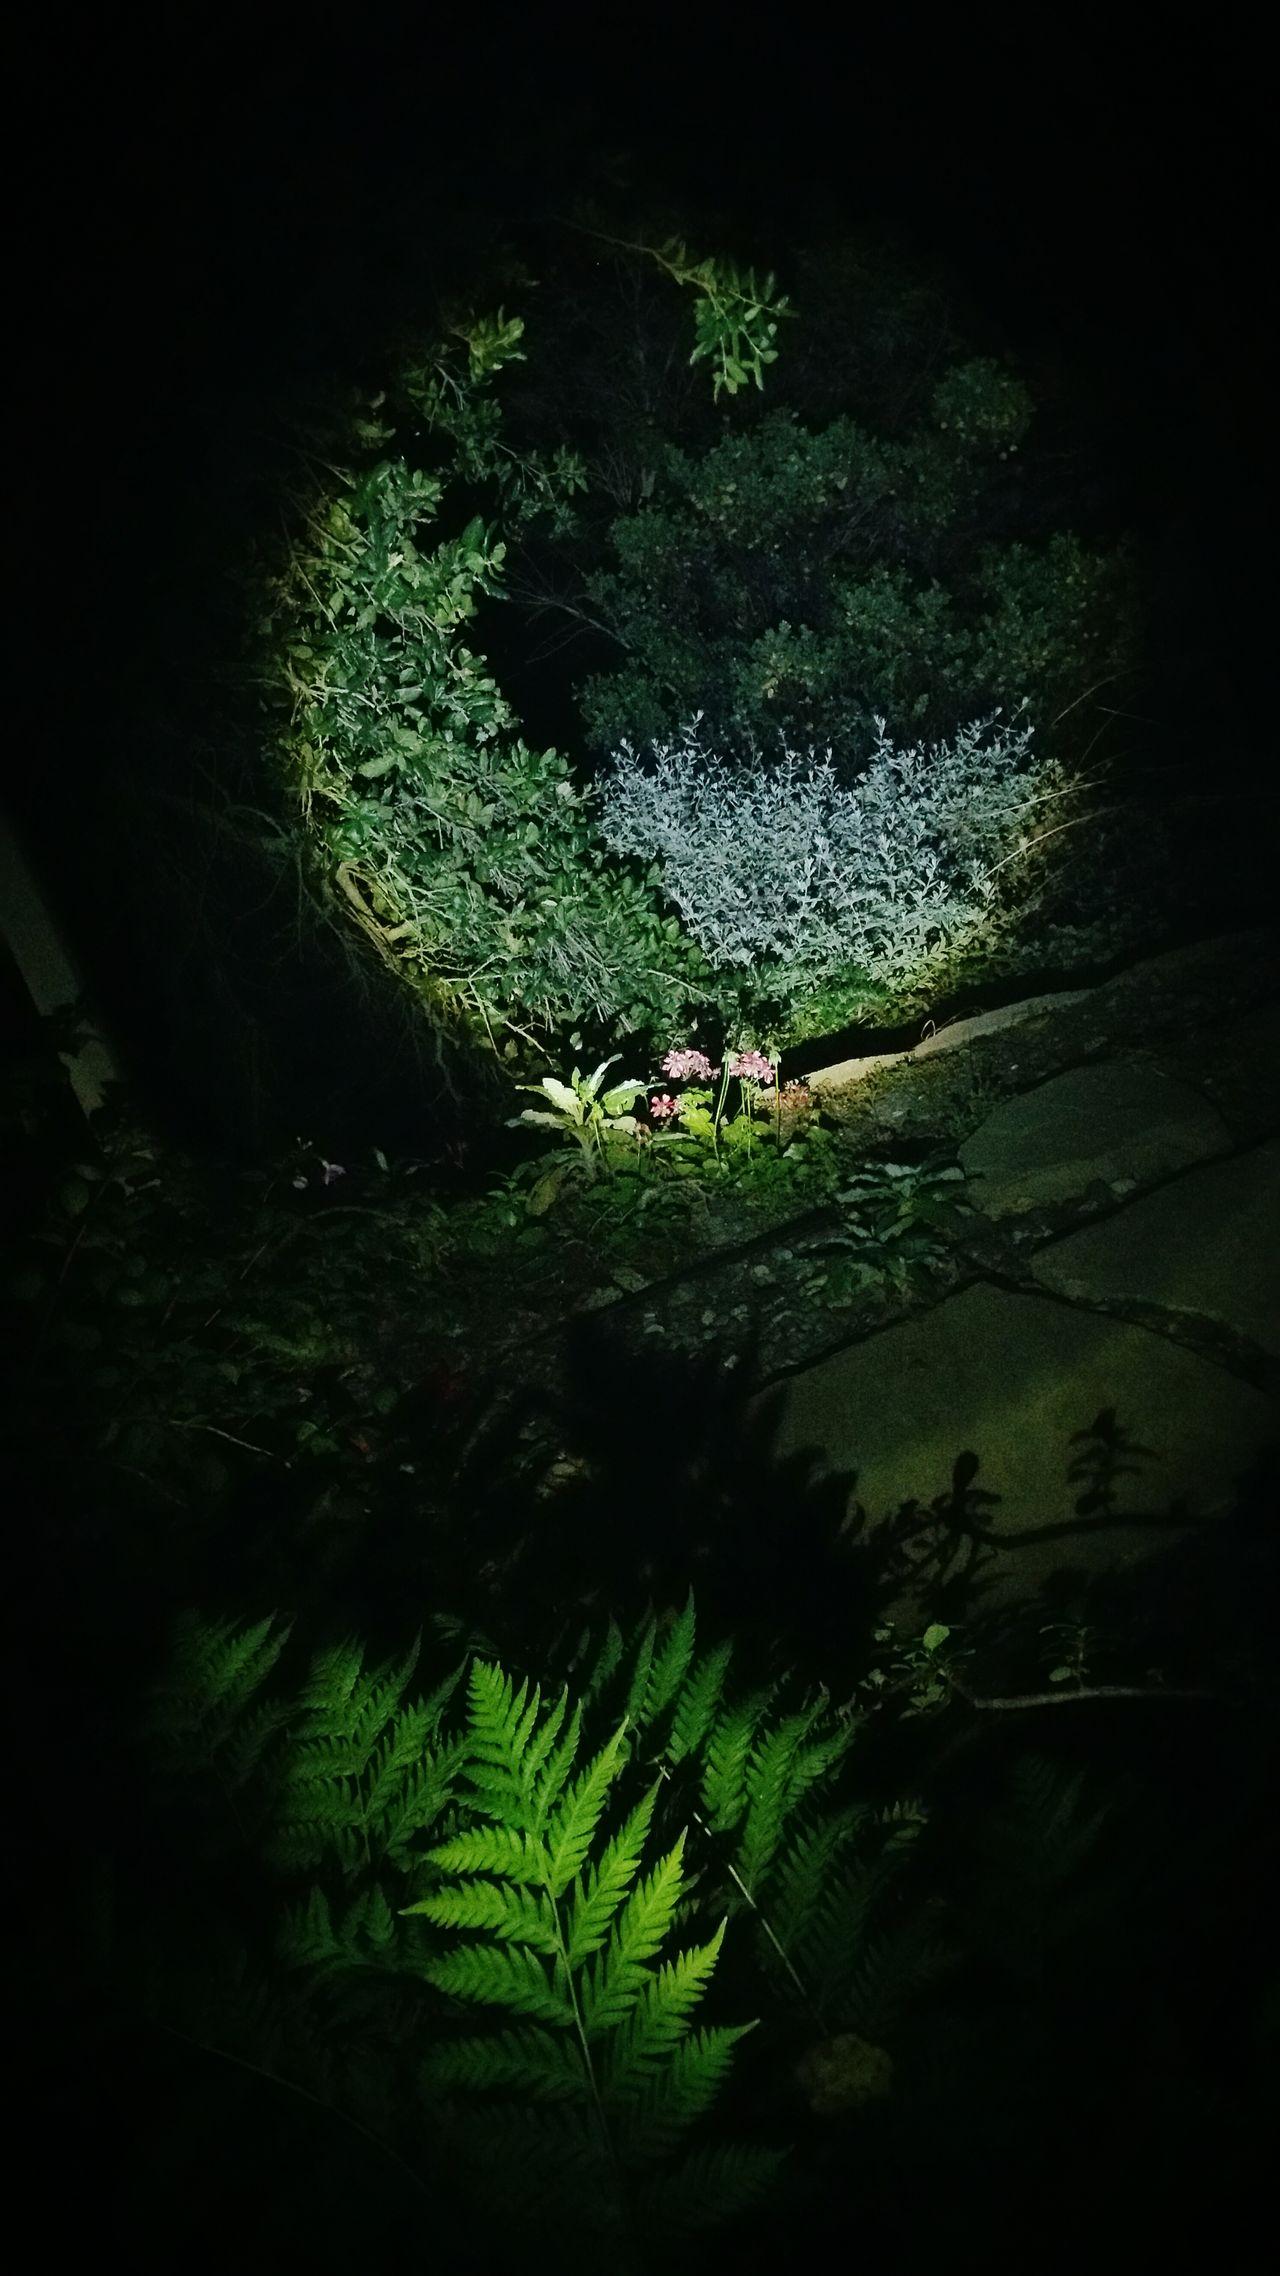 Nightphotography Night Oak Trees Fern Greenery Flashlight Residential Estates EyeEm Best Shots Taking Photos Nature Outdoors Randomshot Minimalism Plant Floorsflowers Overgrown Tree Trunk Enjoying Life